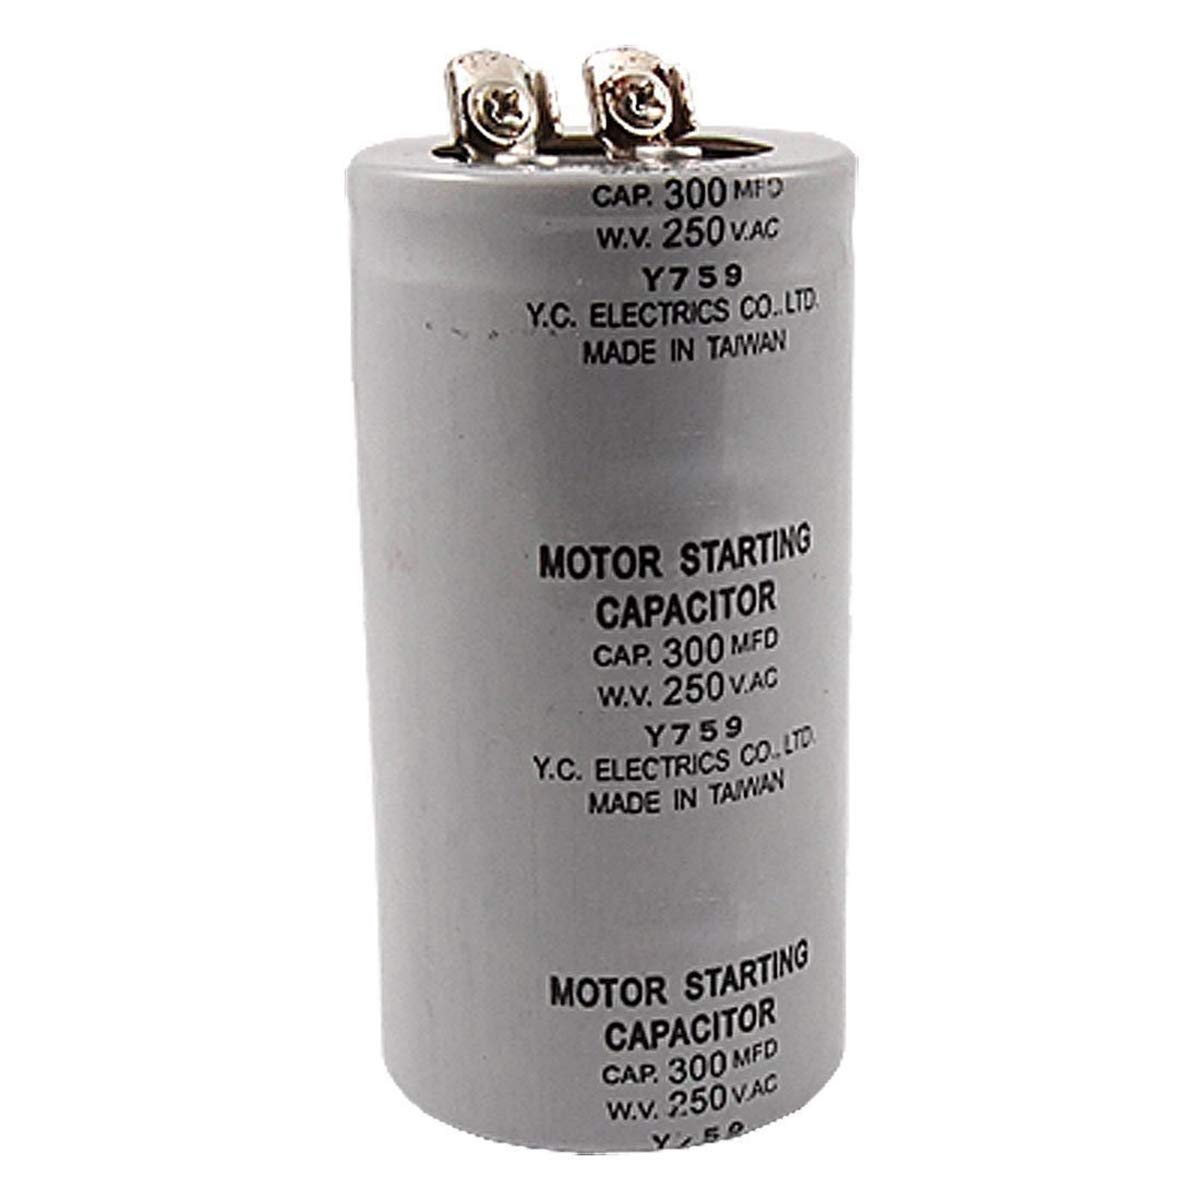 Motor condensador de arranque 300MFD 300uF AC 250 V Terminal de tornillo Motor Condensador de arranque